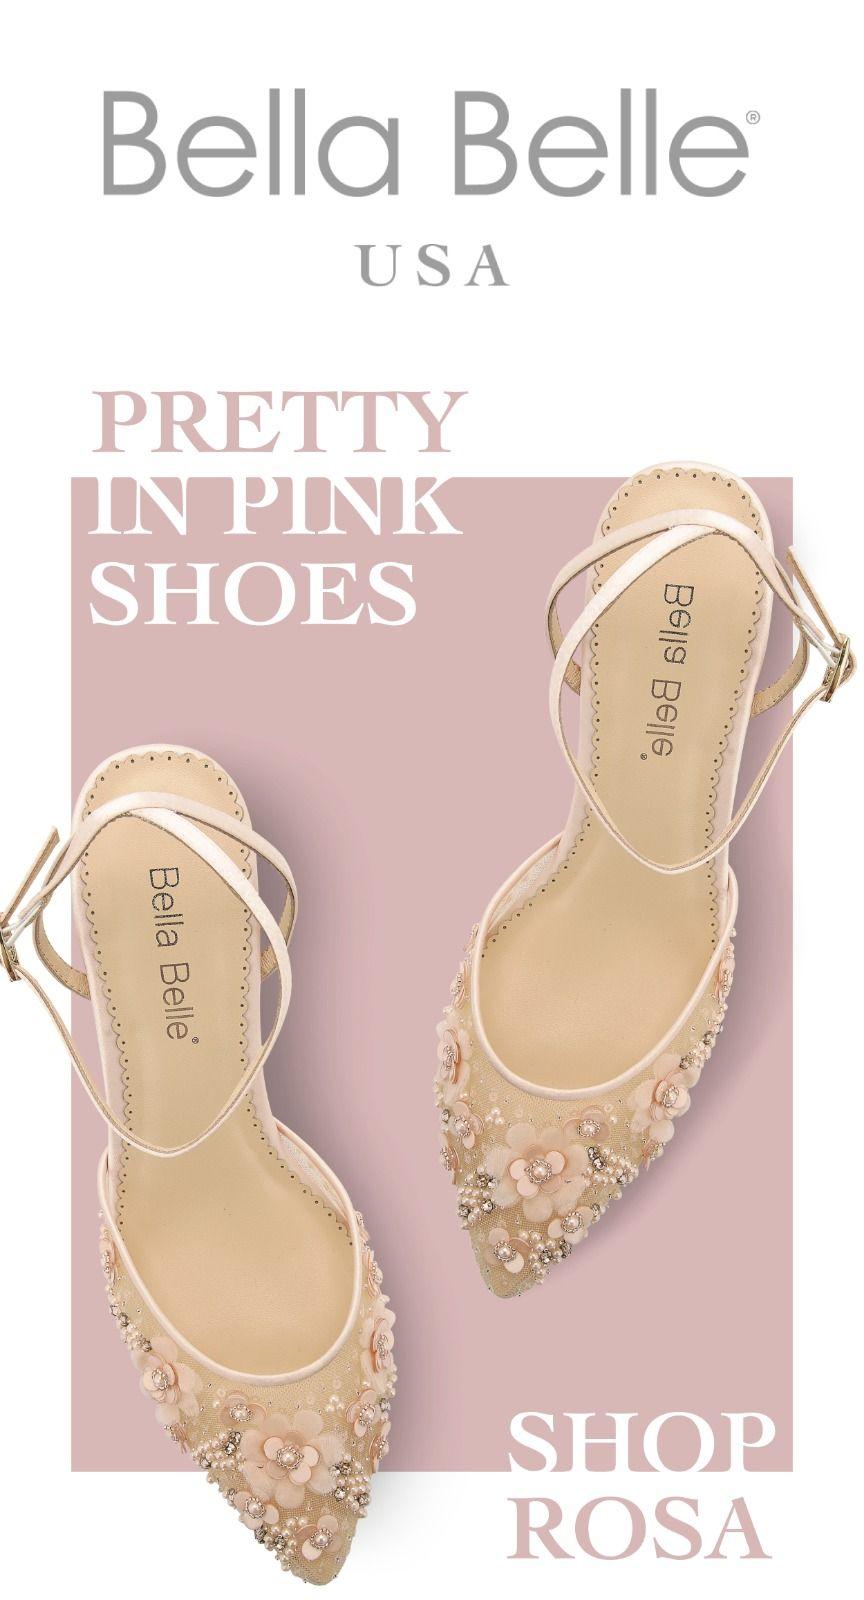 Low Heel Pearl Wedding Evening Shoes In 2020 Wedding Shoes Low Heel Pink Low Heels Blush Wedding Shoes